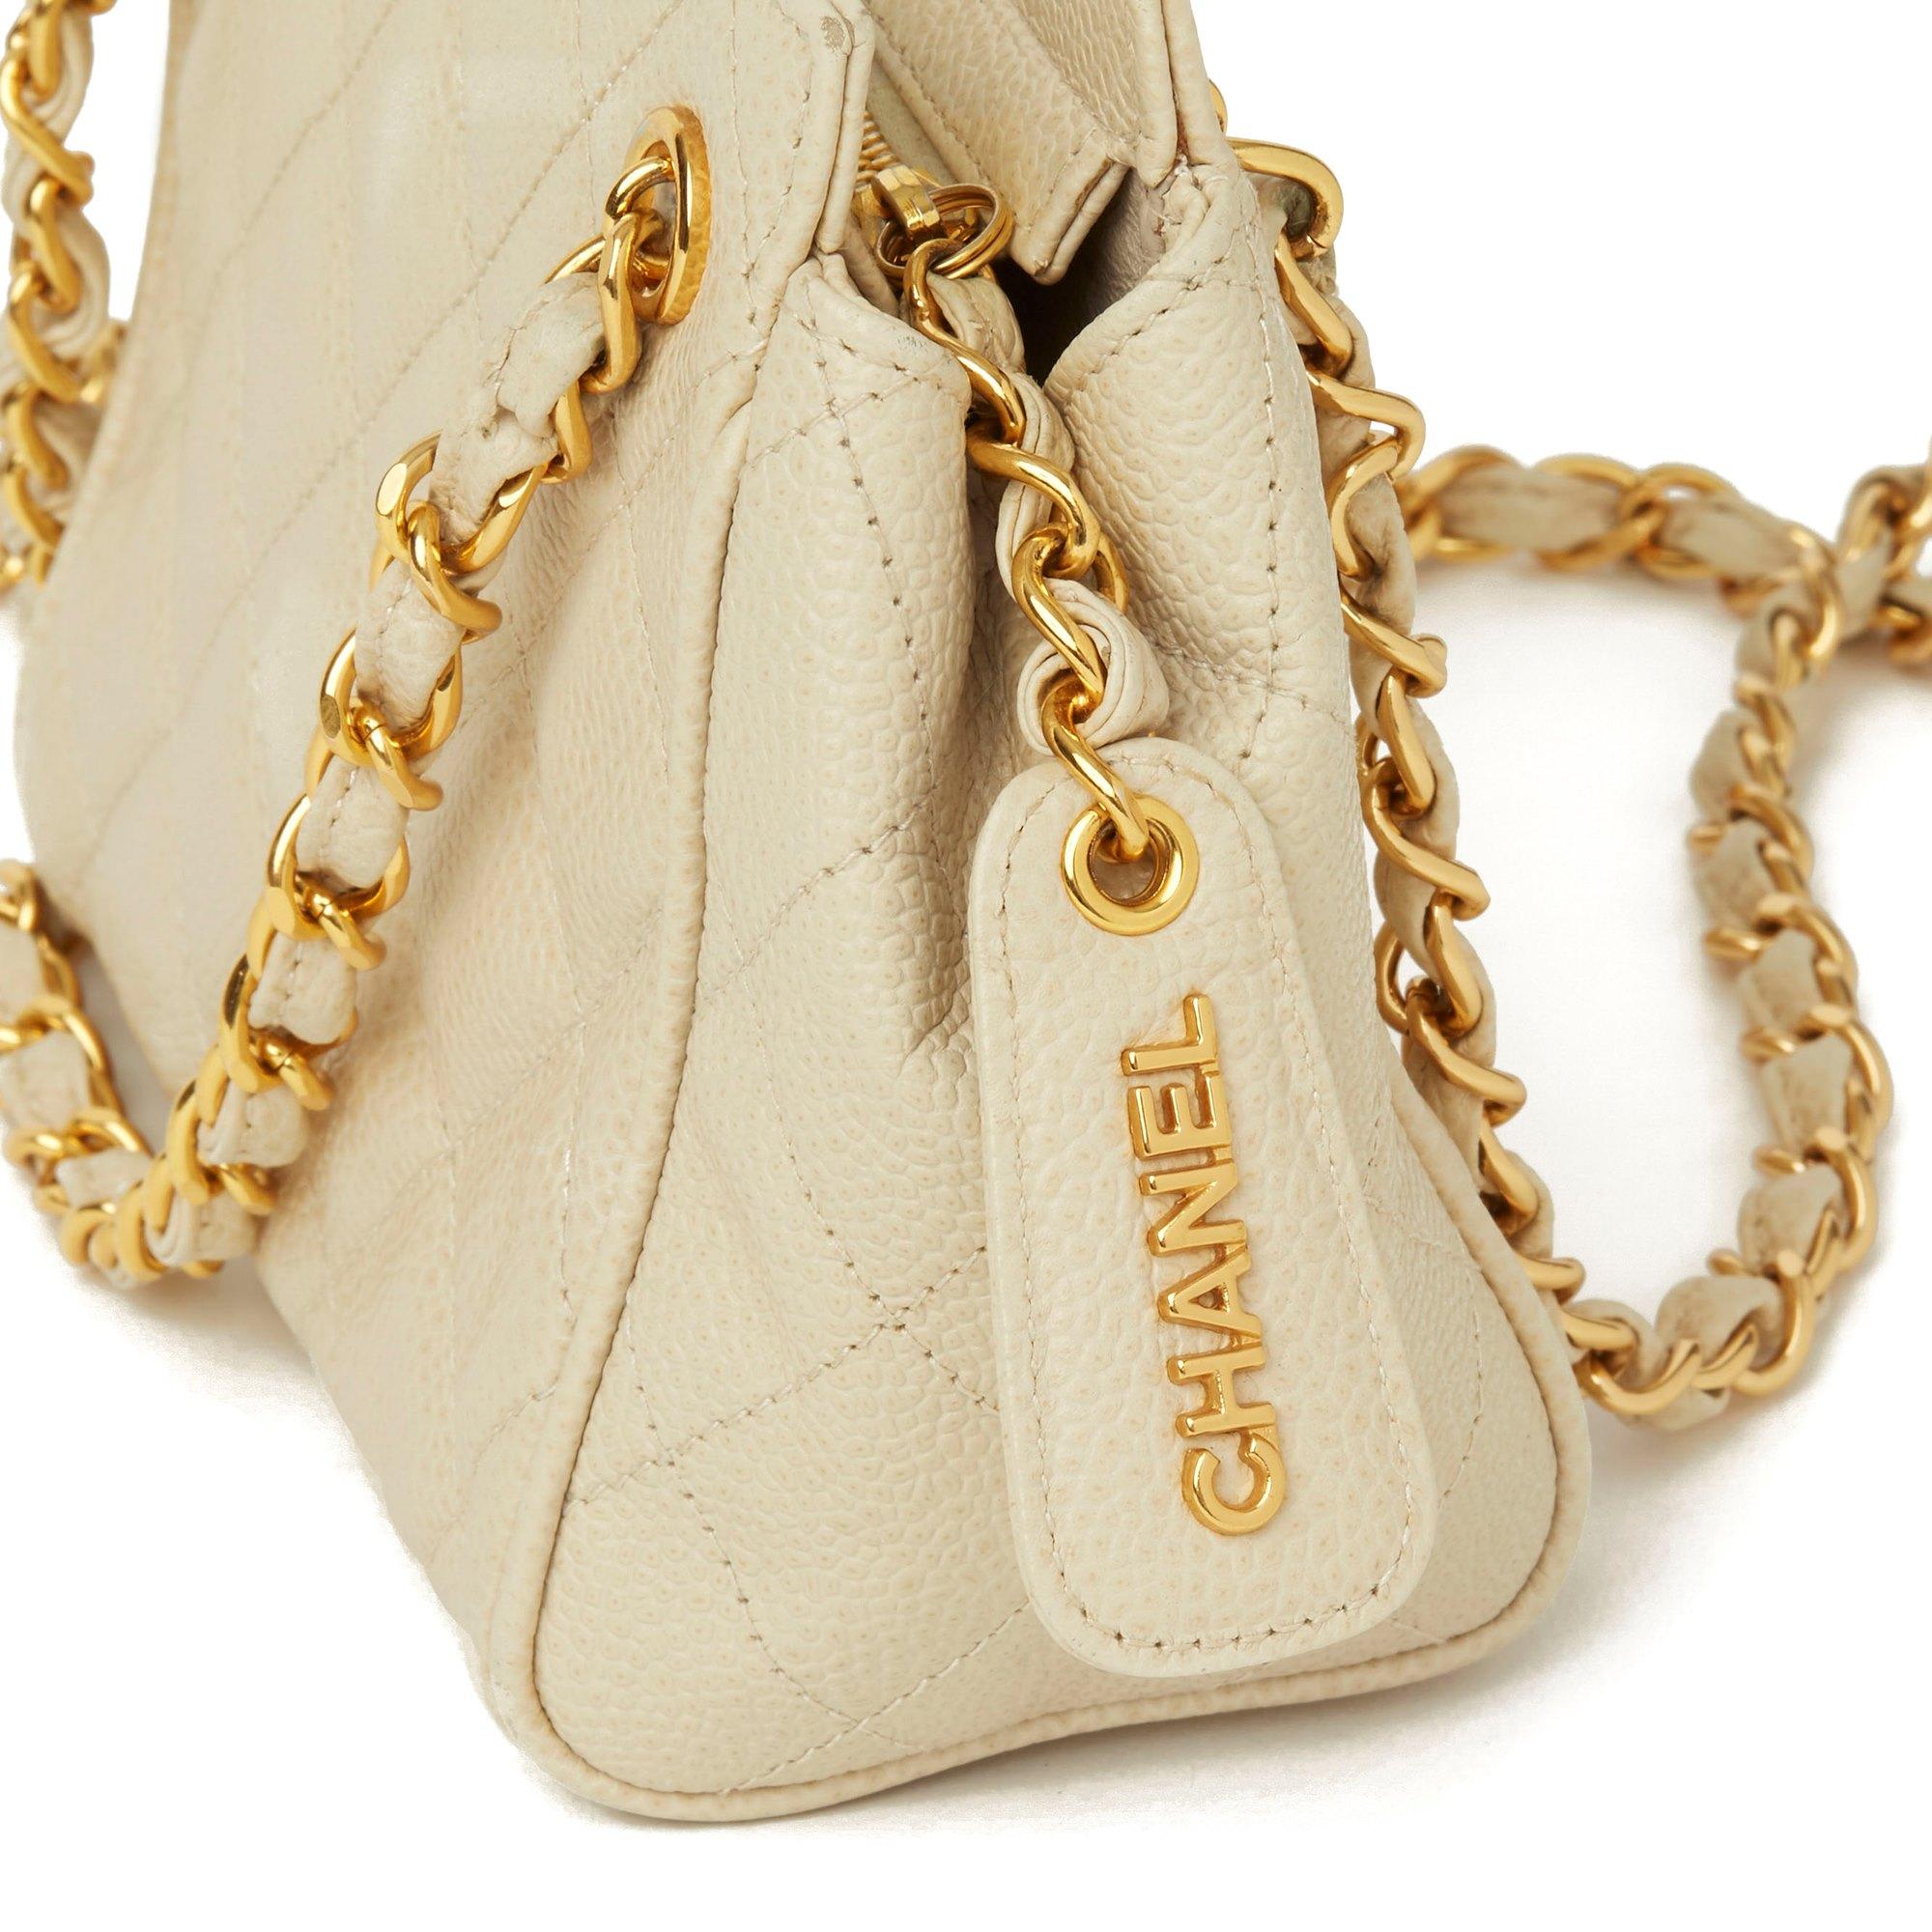 Chanel Beige Quilted Caviar Leather Vintage Mini Timeless Shoulder Bag